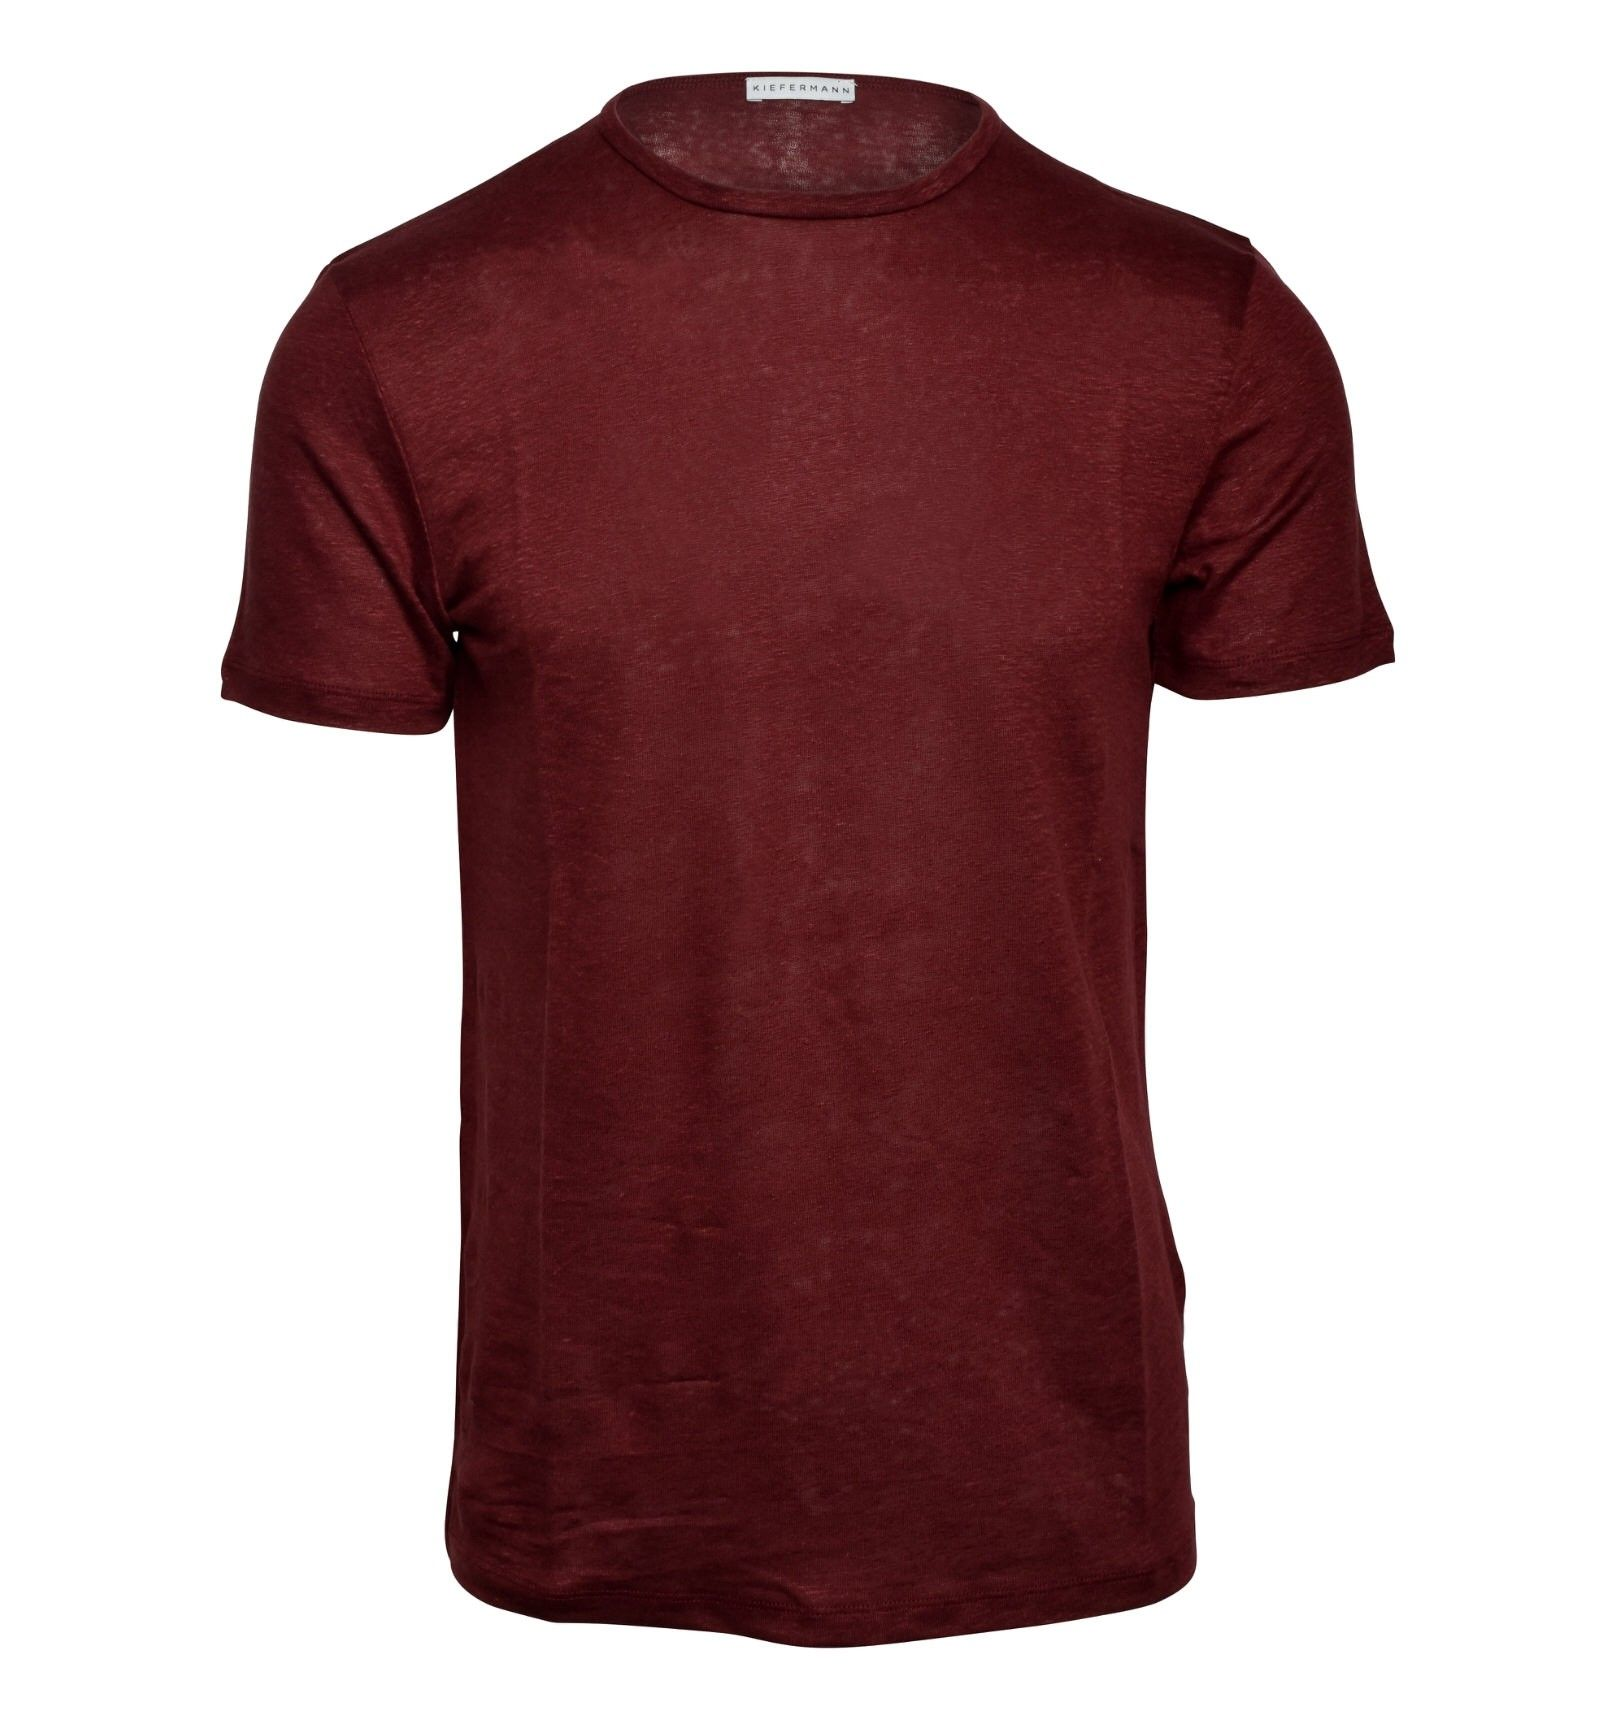 KIEFERMANN - Herren T-Shirt - Laine - Brick